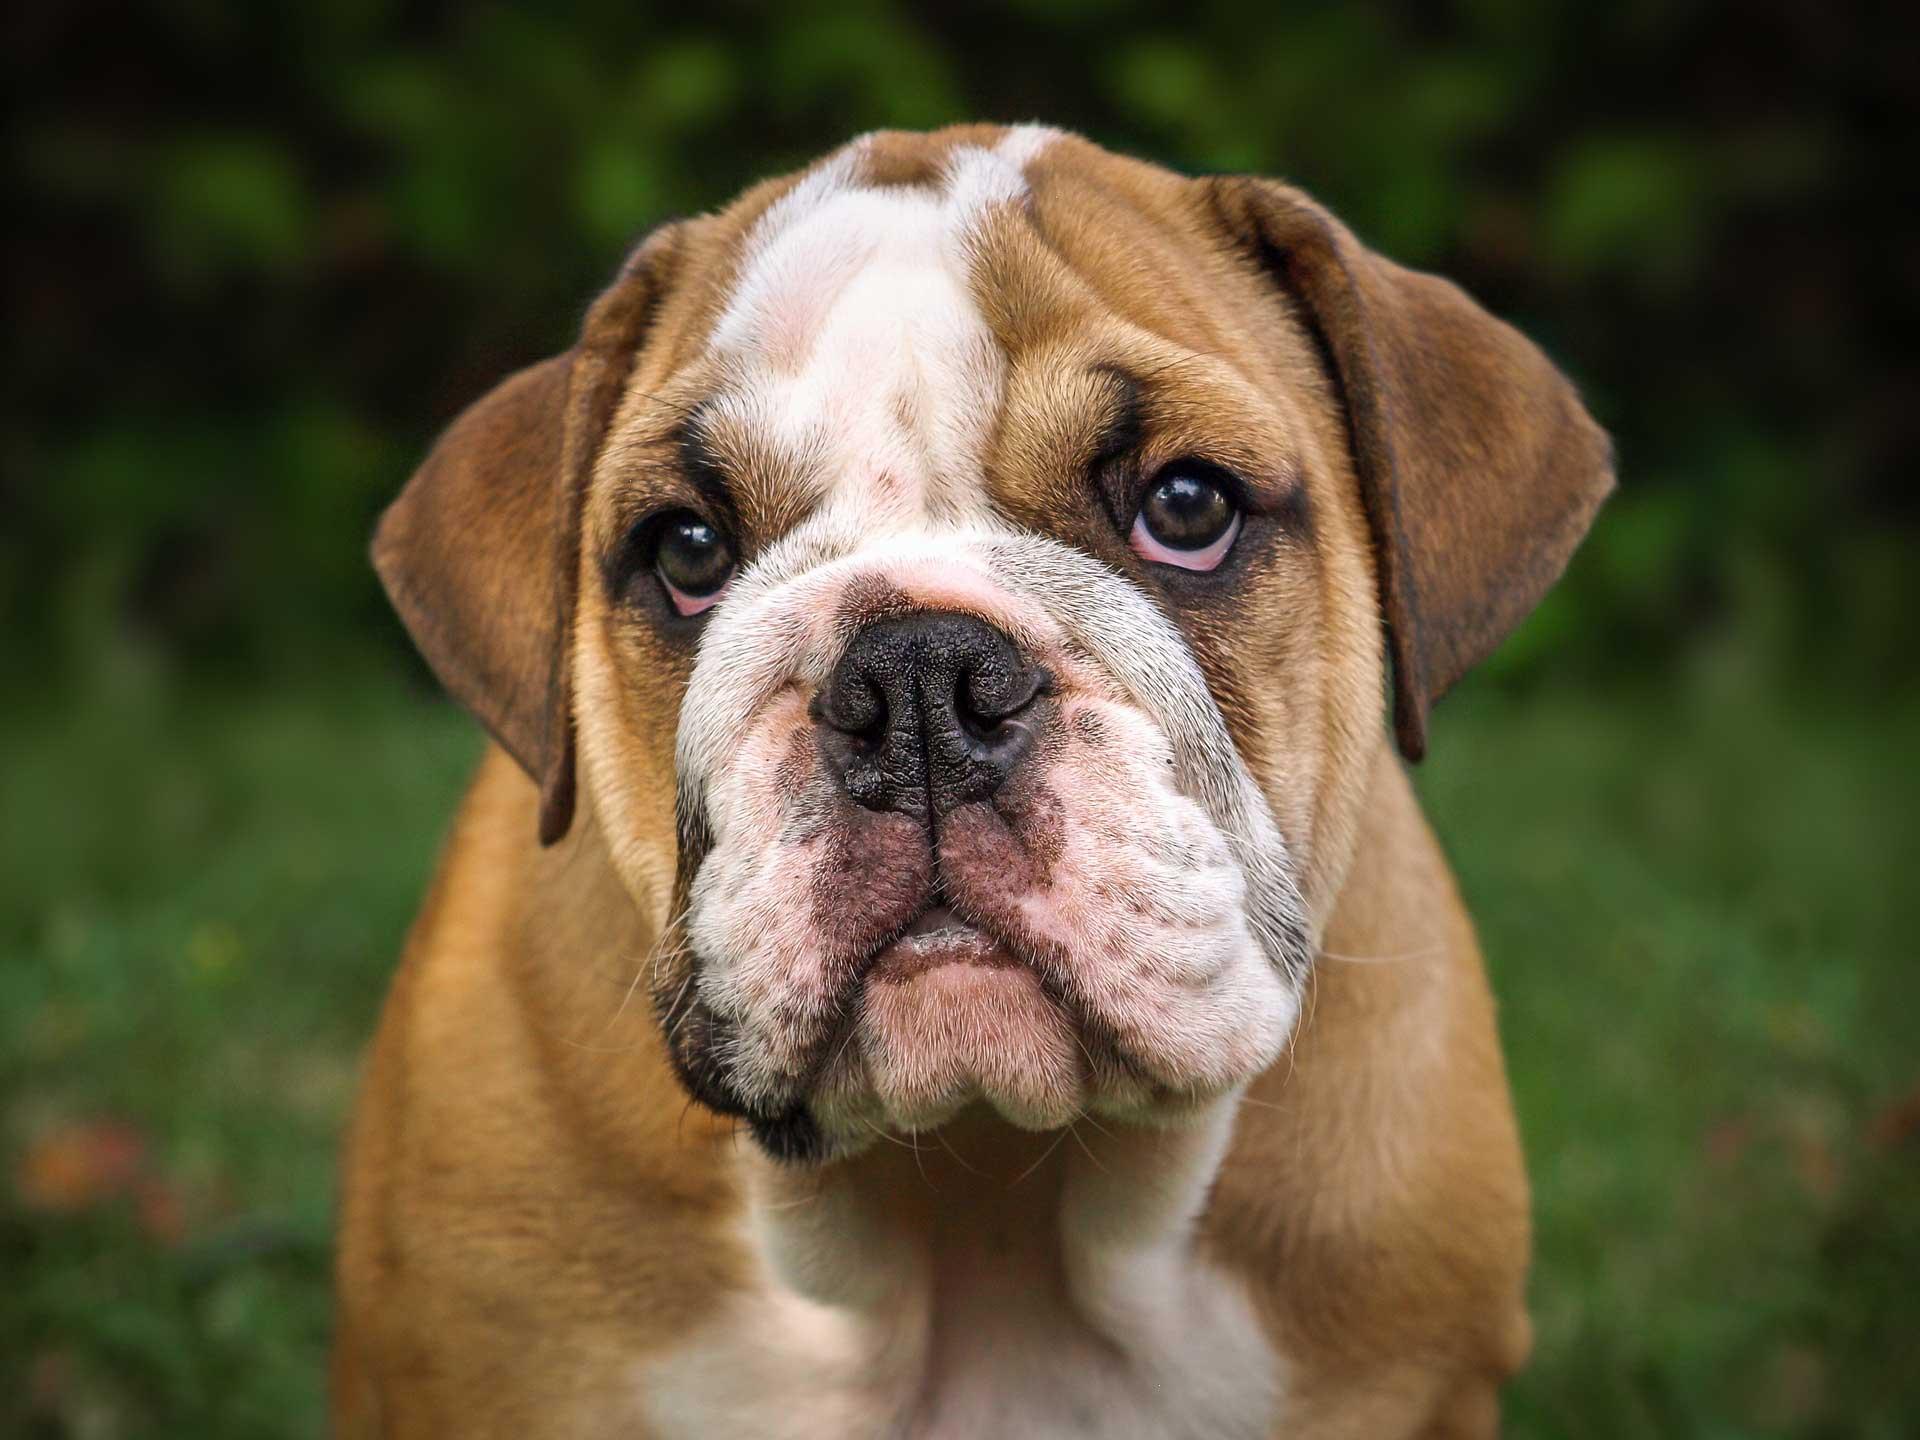 Valp engelsk bulldog. Foto: Pixabay